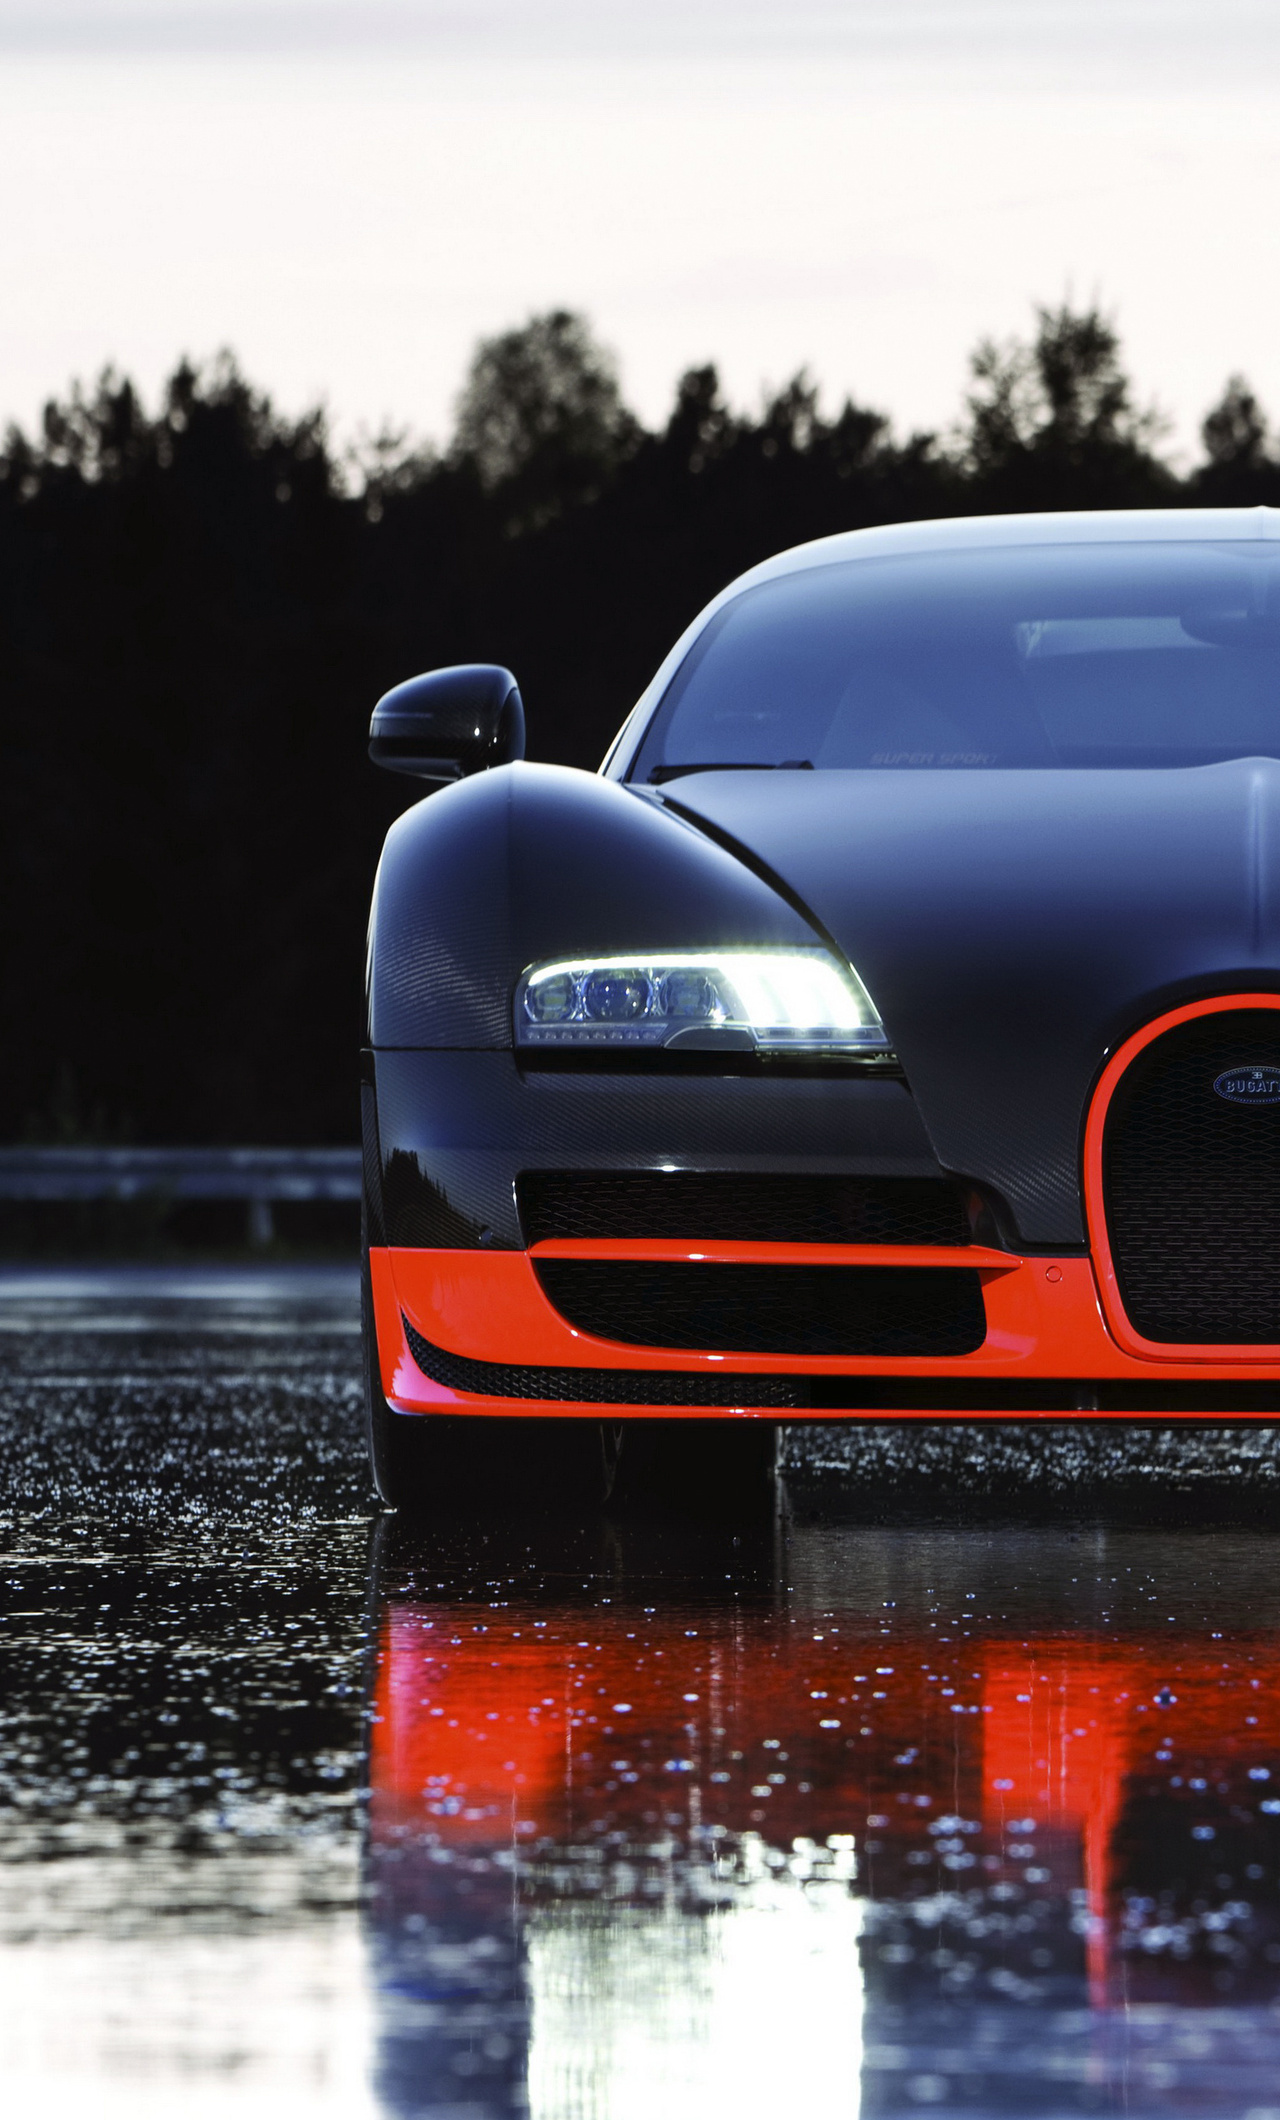 bugatti-veyron-super-sport-world-record-edition-4k-7w.jpg